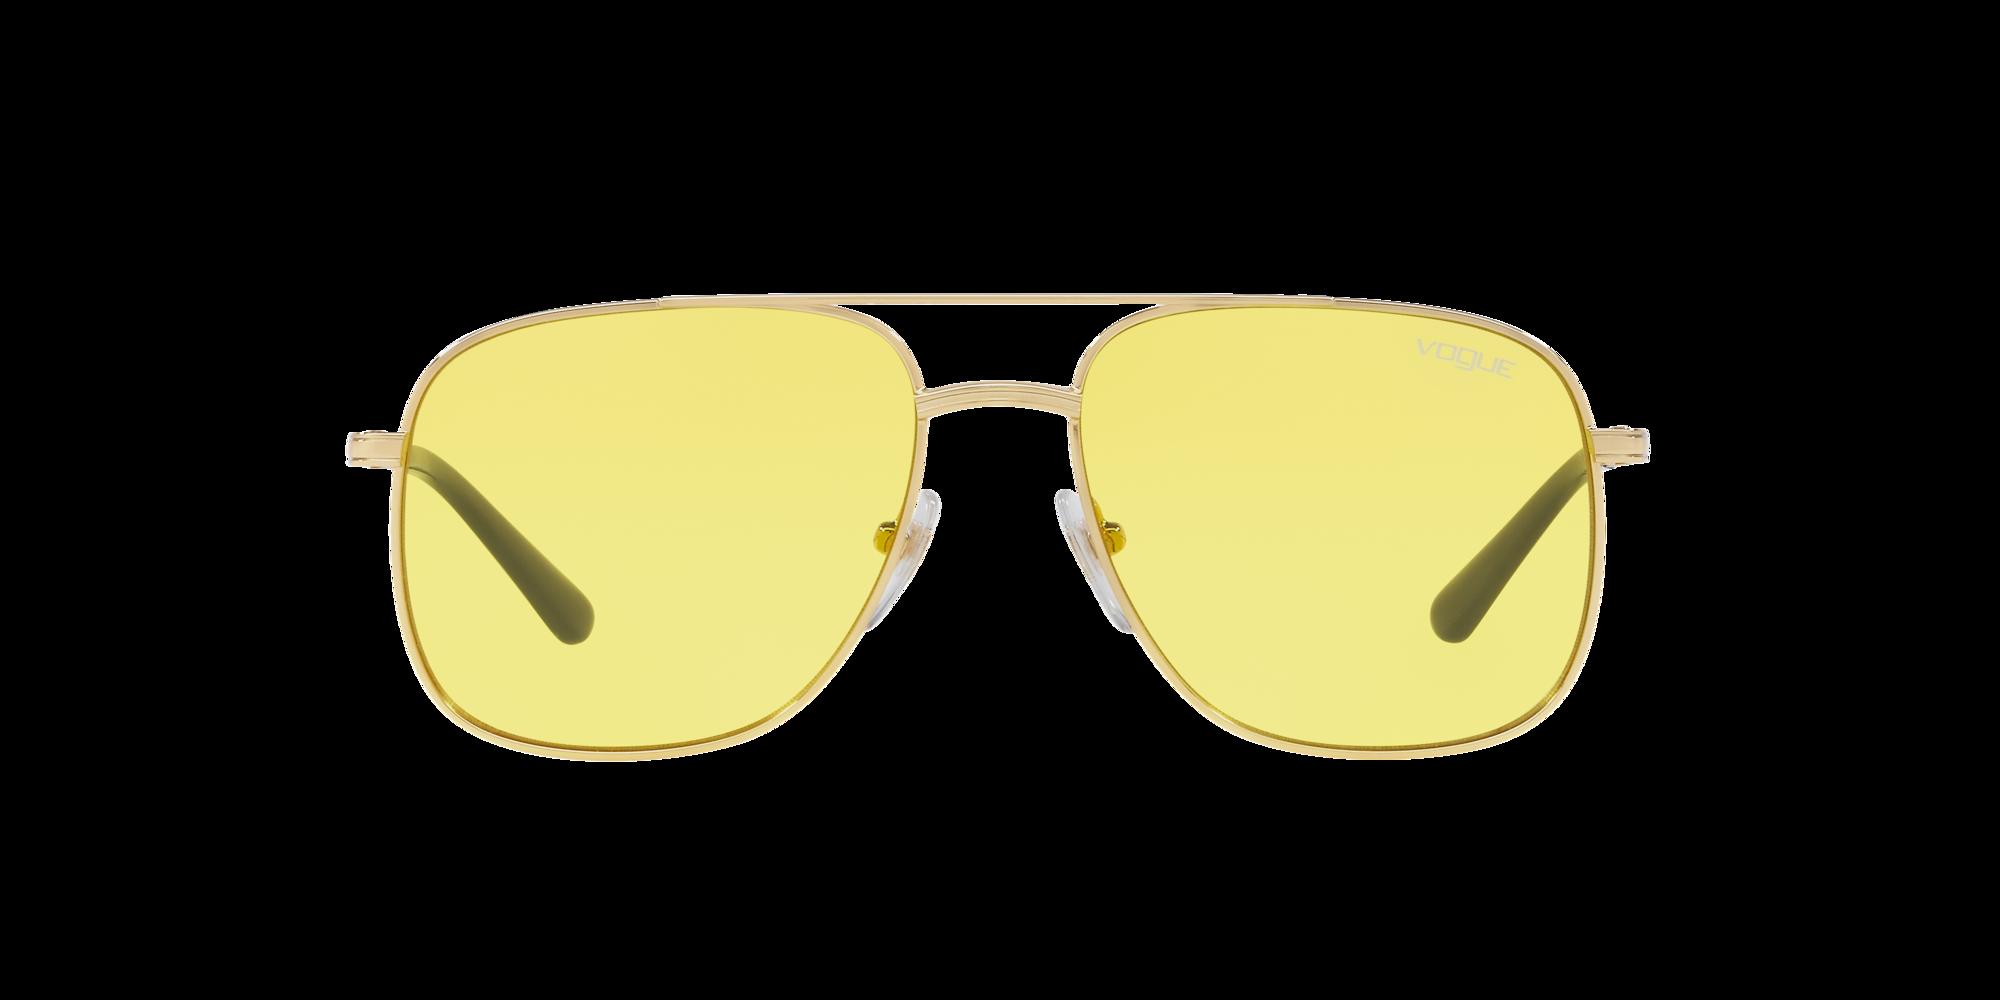 5831b16e95 ... gafas de sol VOGUE VO 4083S 280/85 BY GIGI HADID. 360° Product View  360° Product View ...